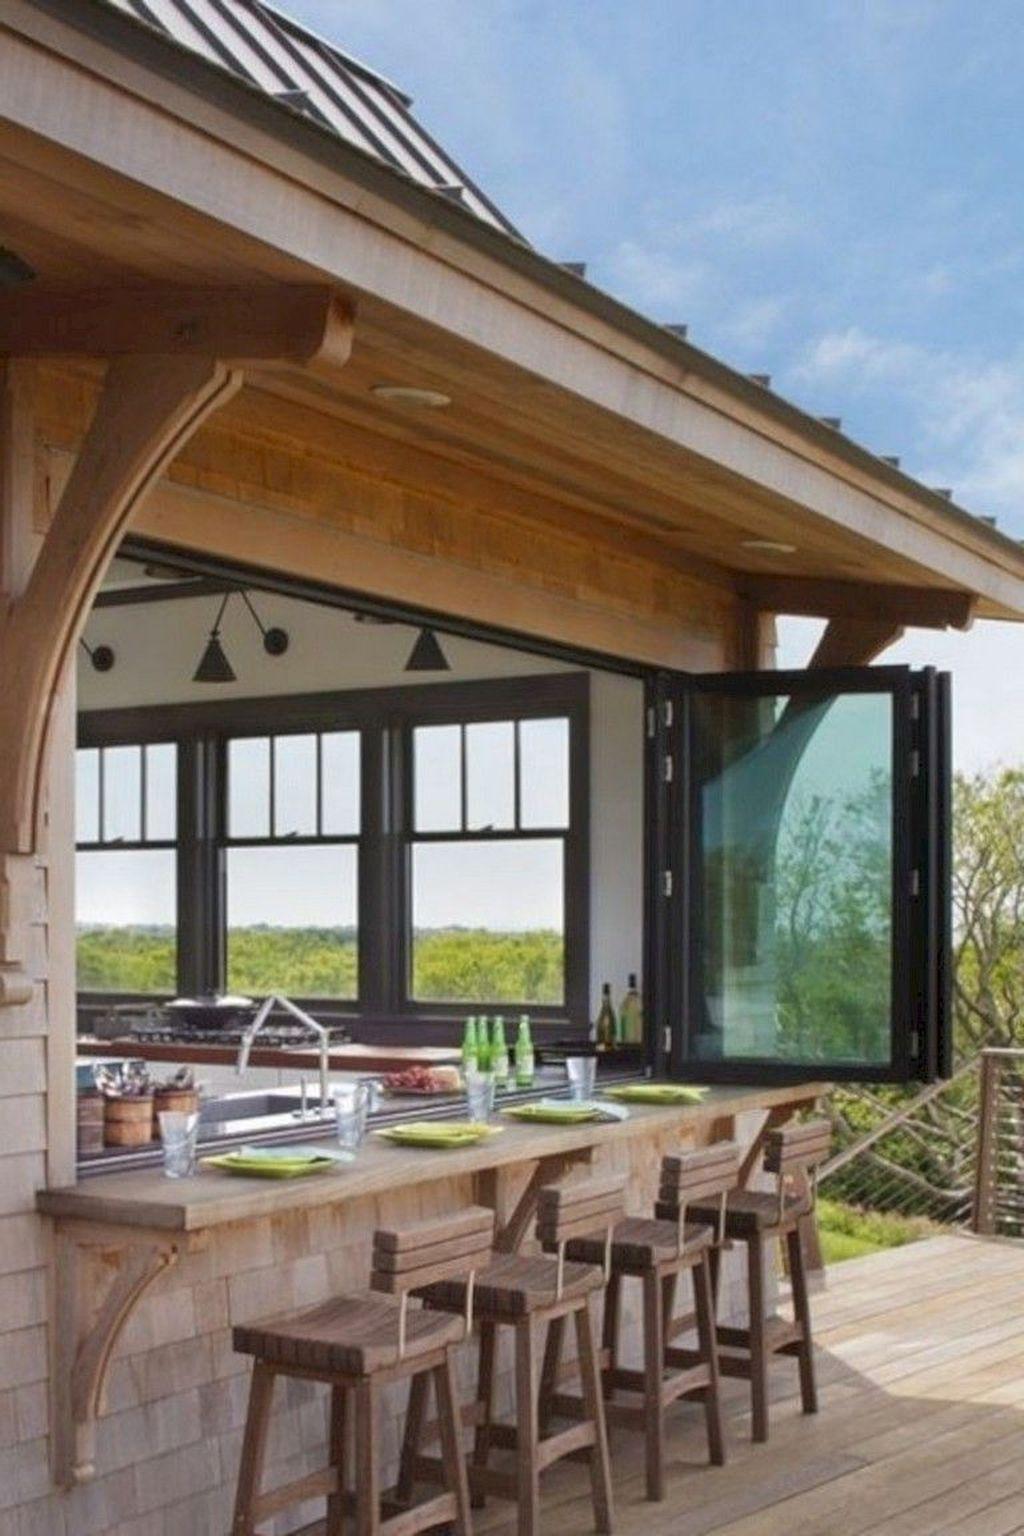 Stunning Outdoor Kitchen Design Ideas For Perfect Summer 08